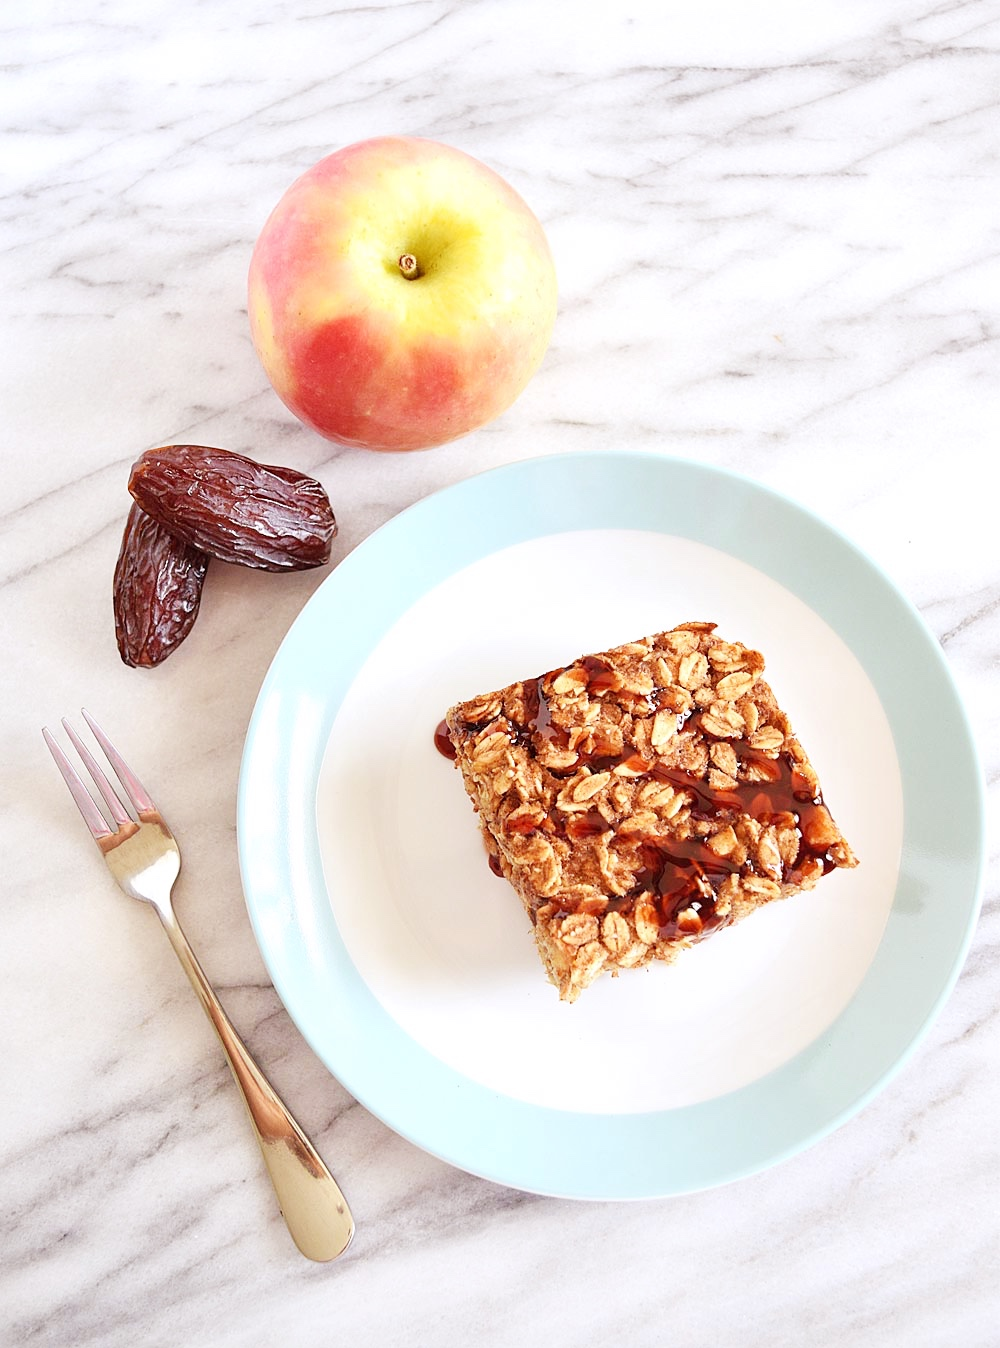 Vegan Caramel Apple Baked Oatmeal